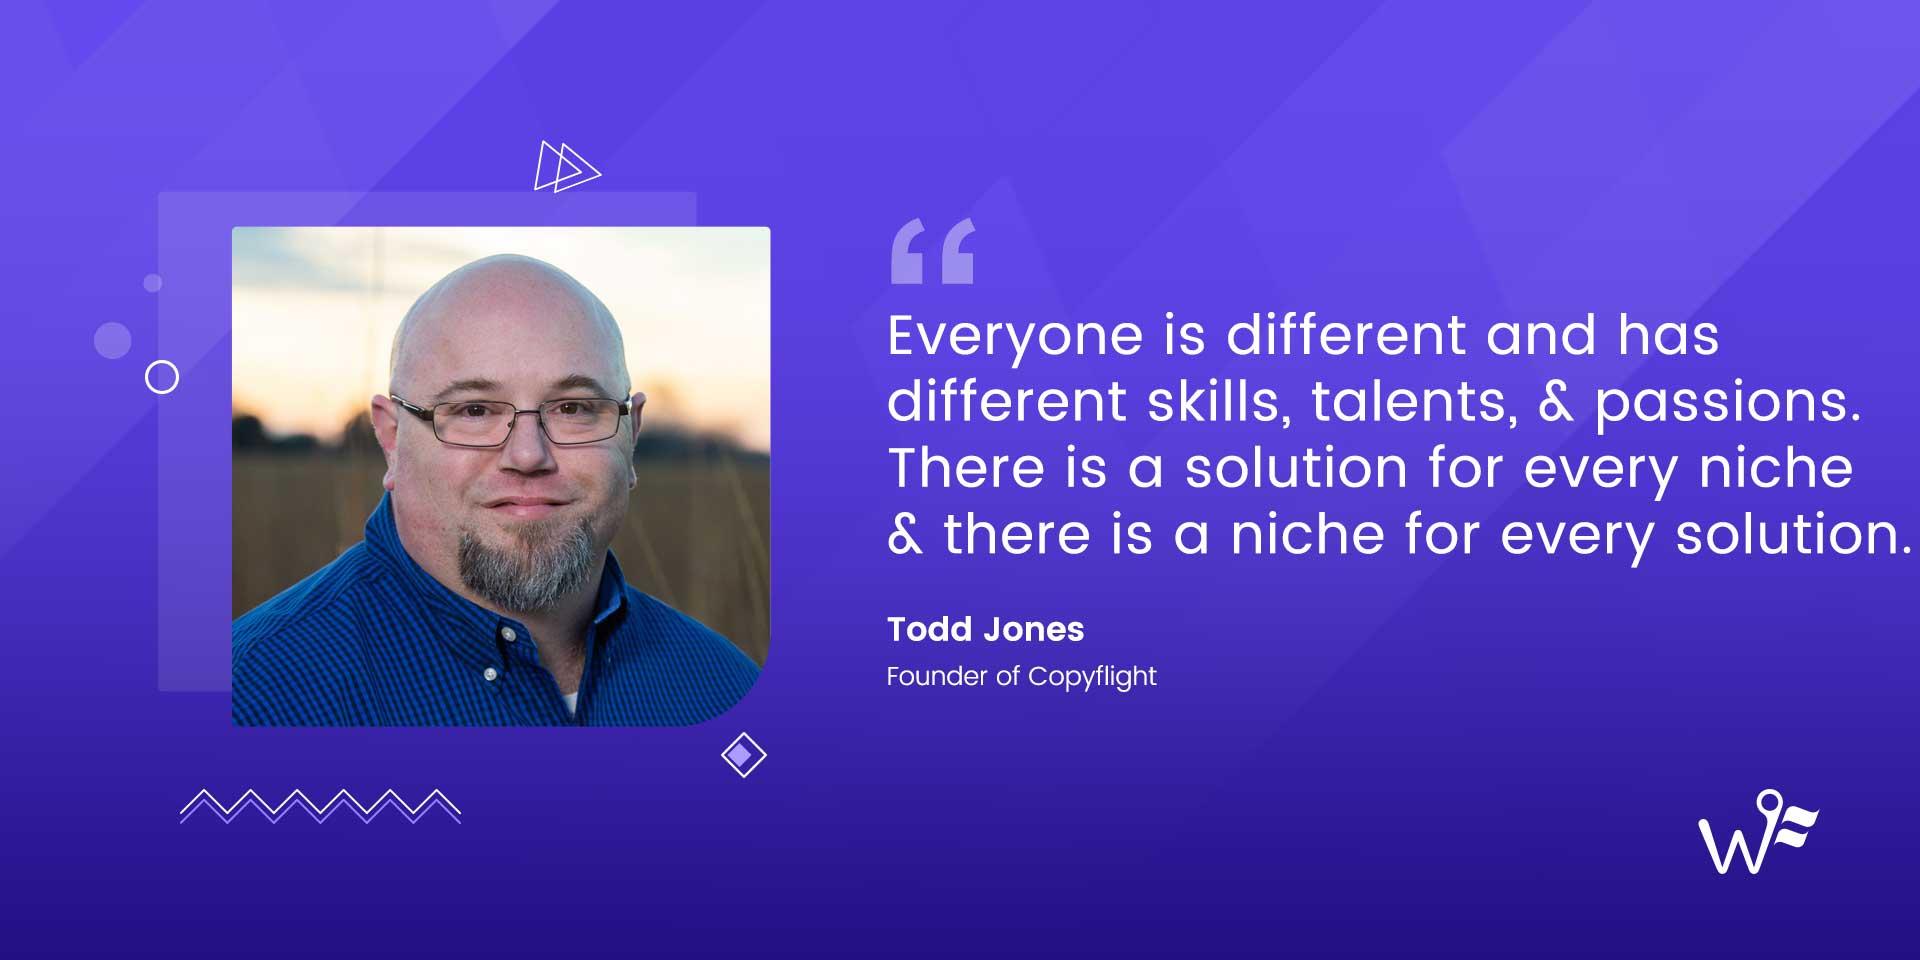 todd-jones-of-copyflight